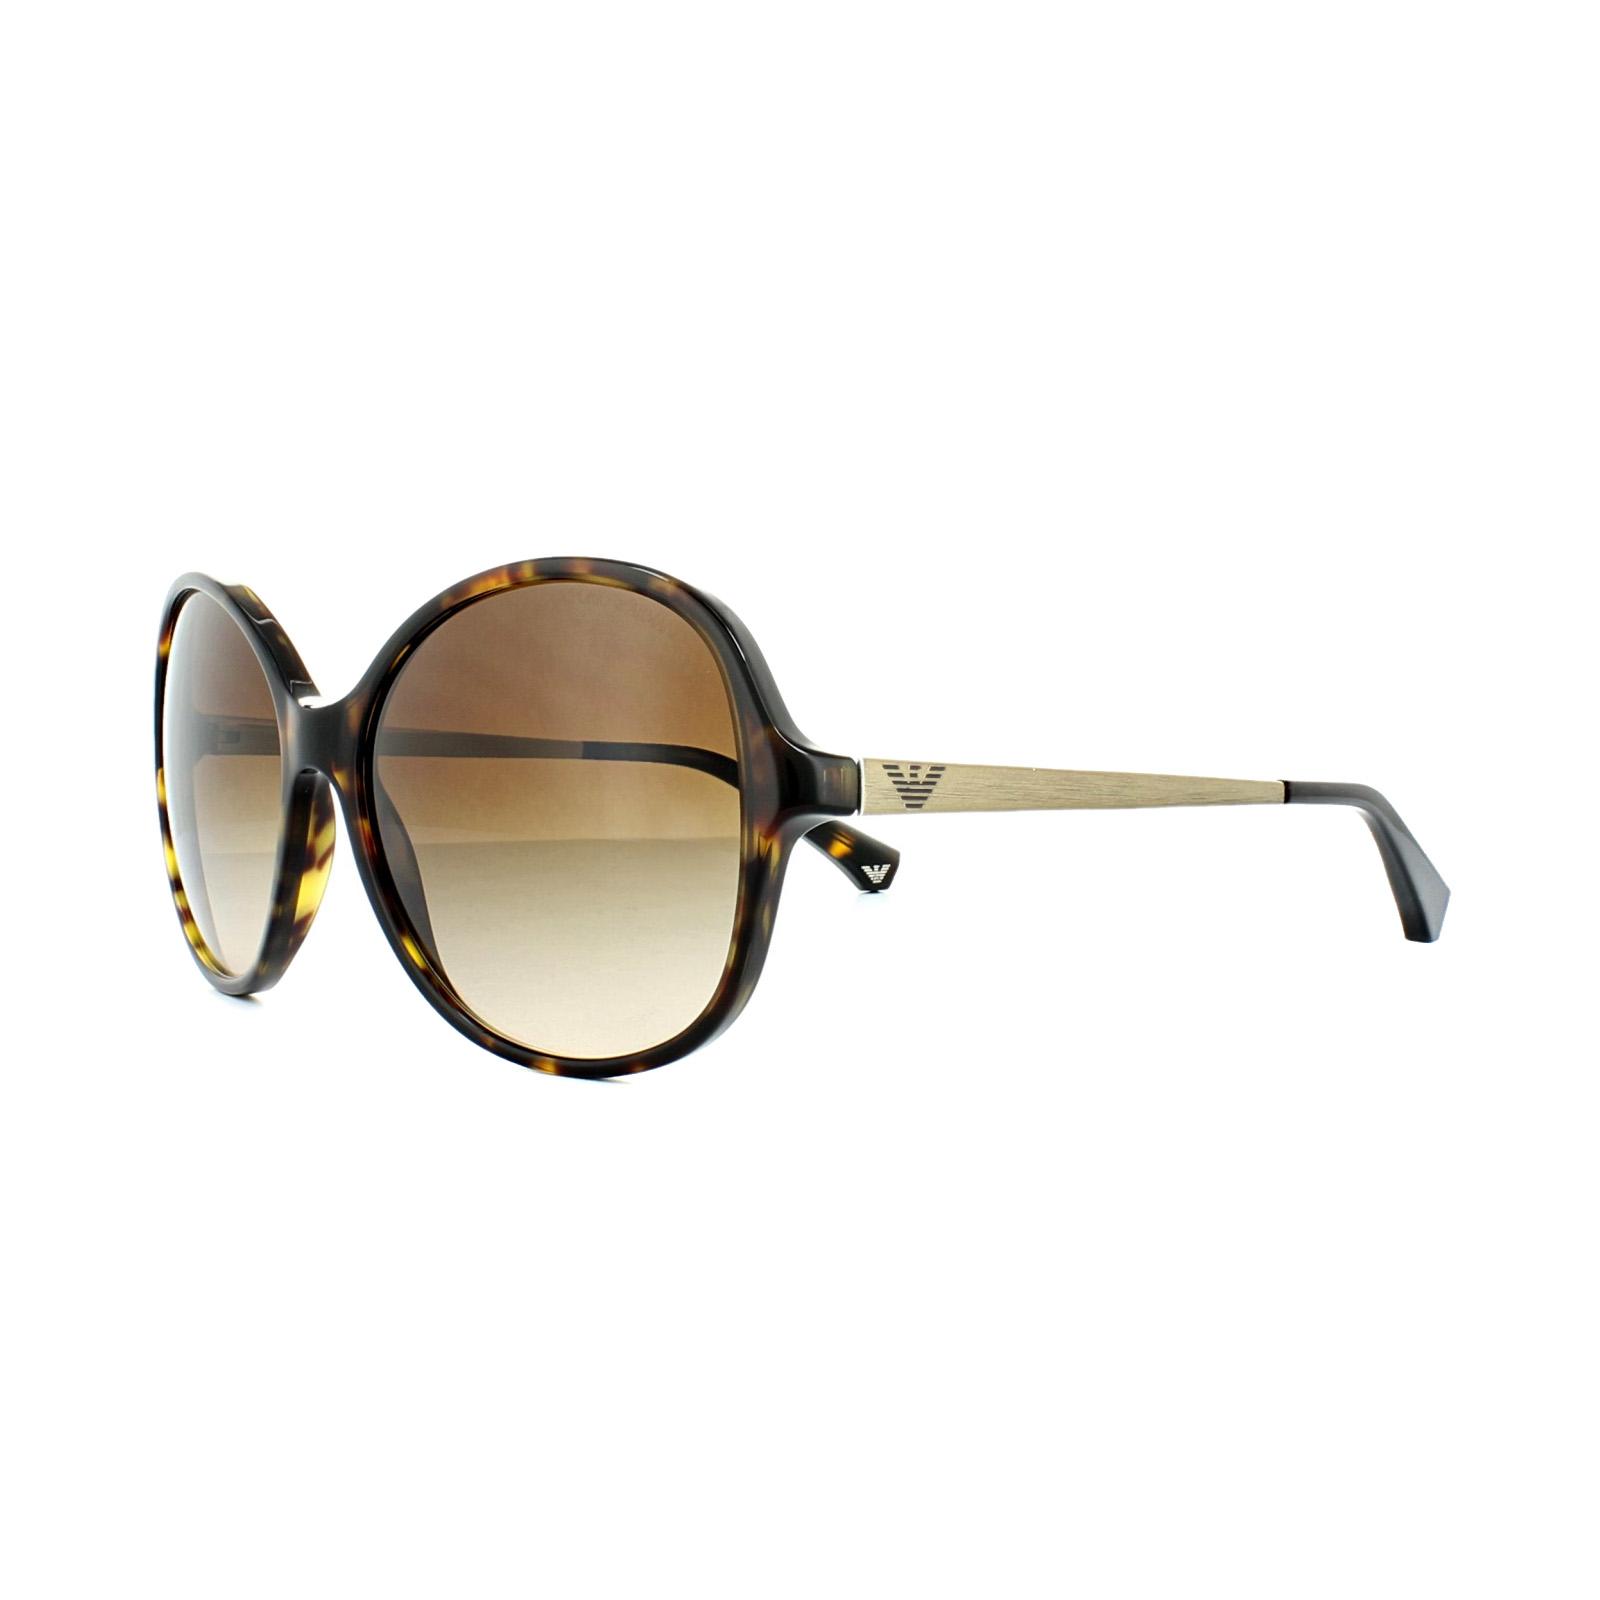 77177d9ff32 Sentinel Emporio Armani Sunglasses 4024 502613 Dark Havana Matt Gold Brown  Gradient